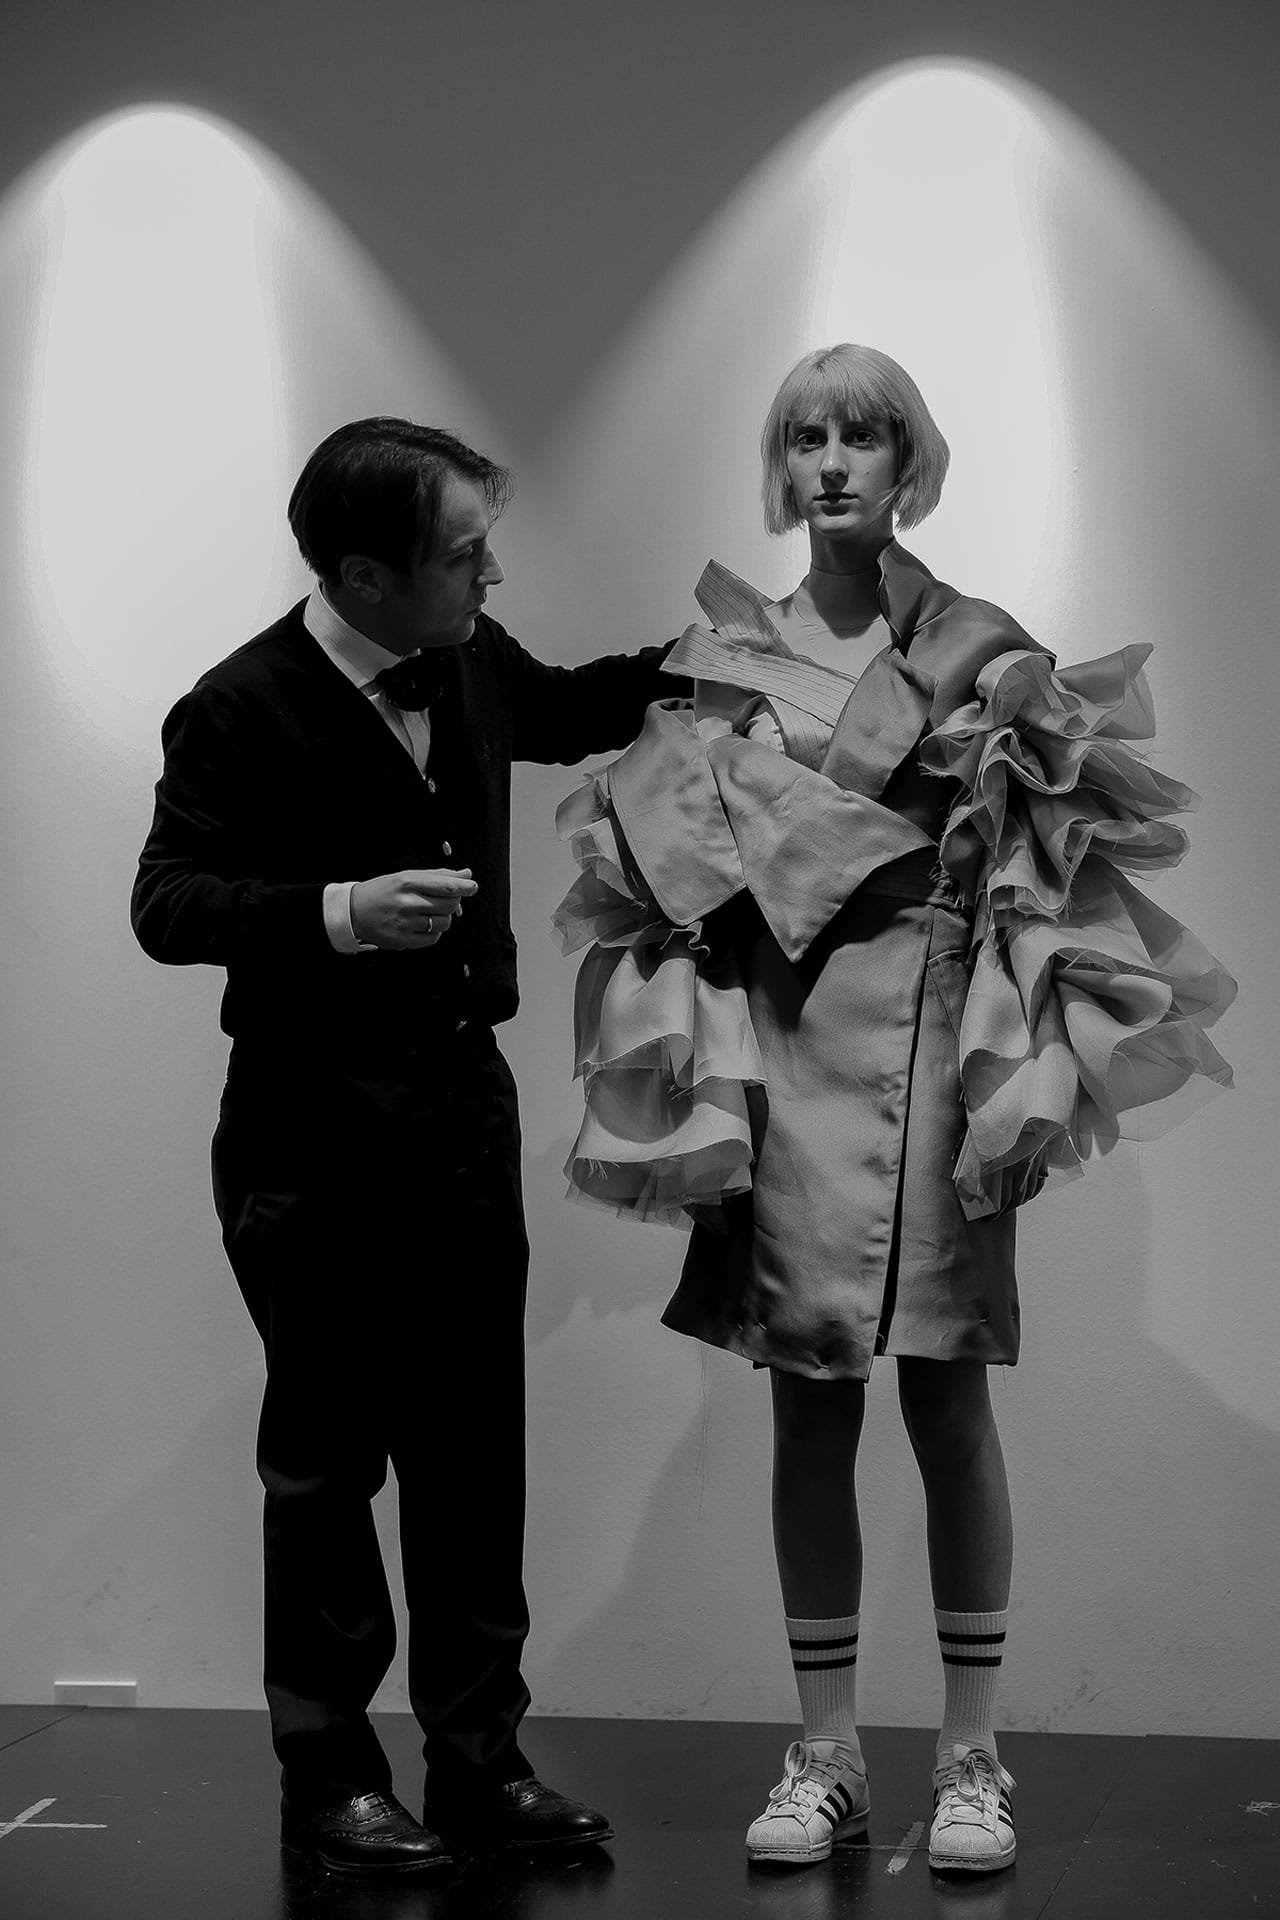 polimoda modeutbildning